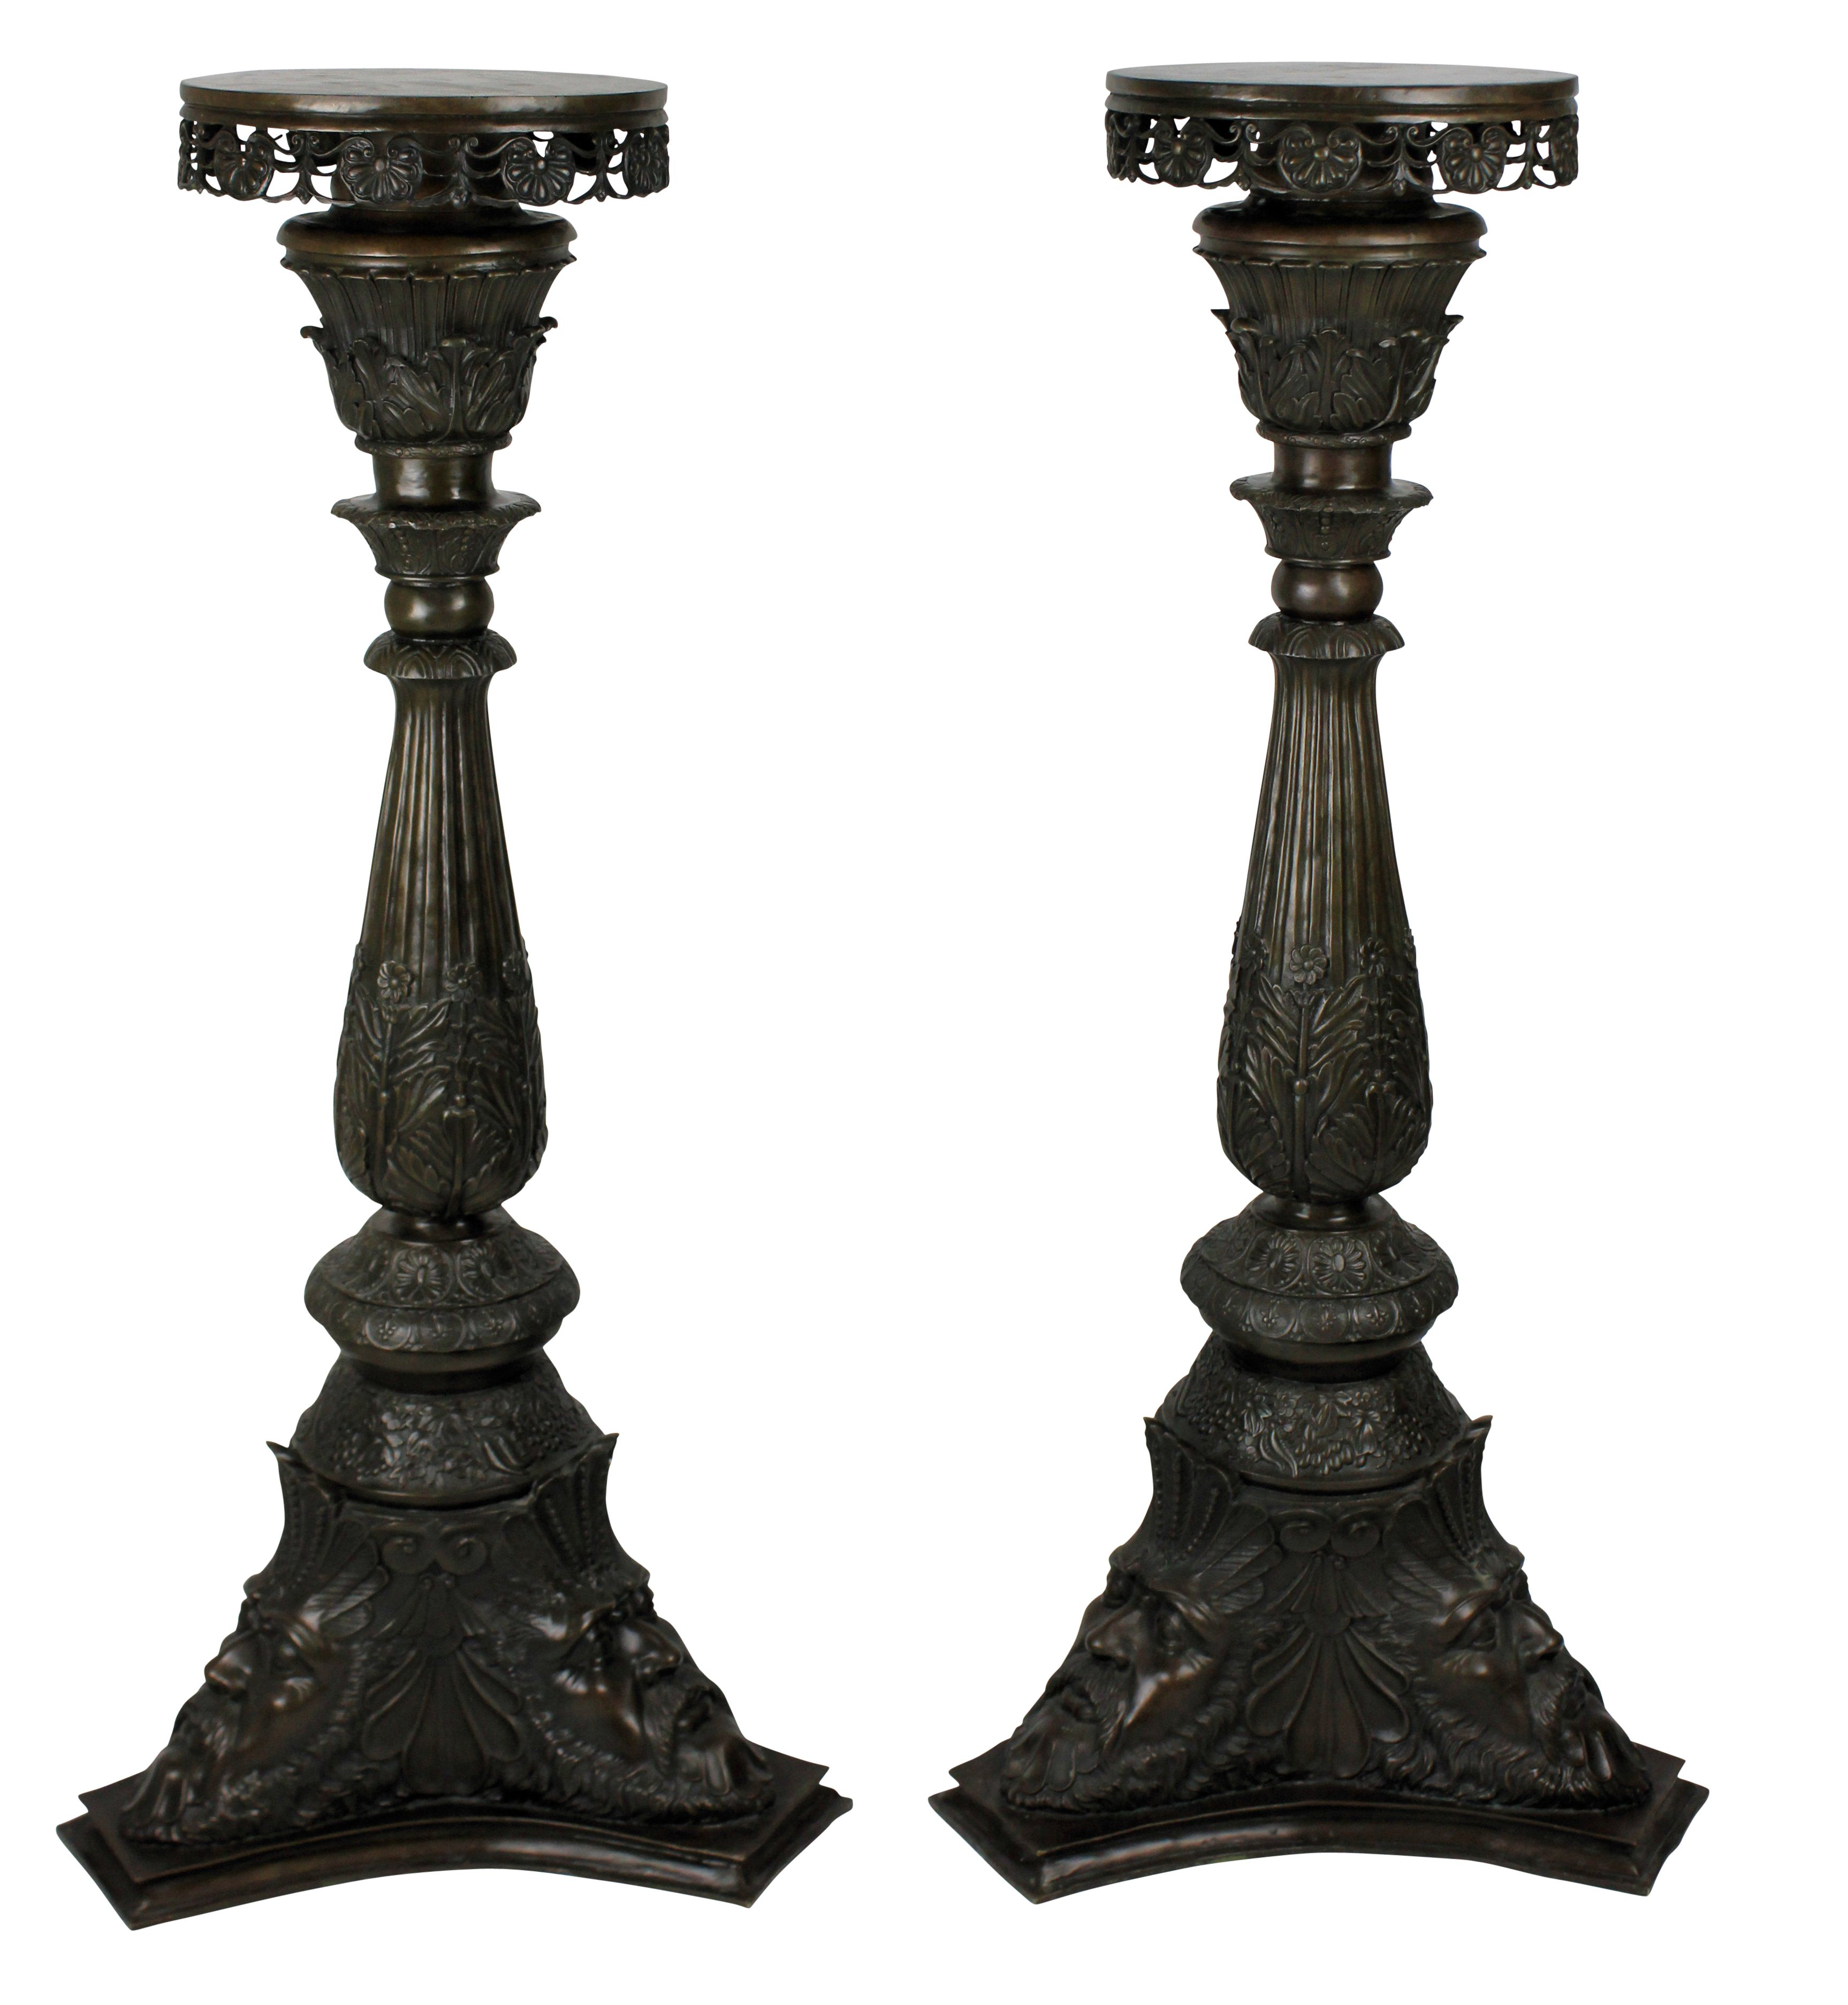 A rare and beautifully cast pair of Venetian bronze torchere, in the Classical manner. c.1880 Measures: 110cm high x 52cm diameter x 18cm diameter (tops)